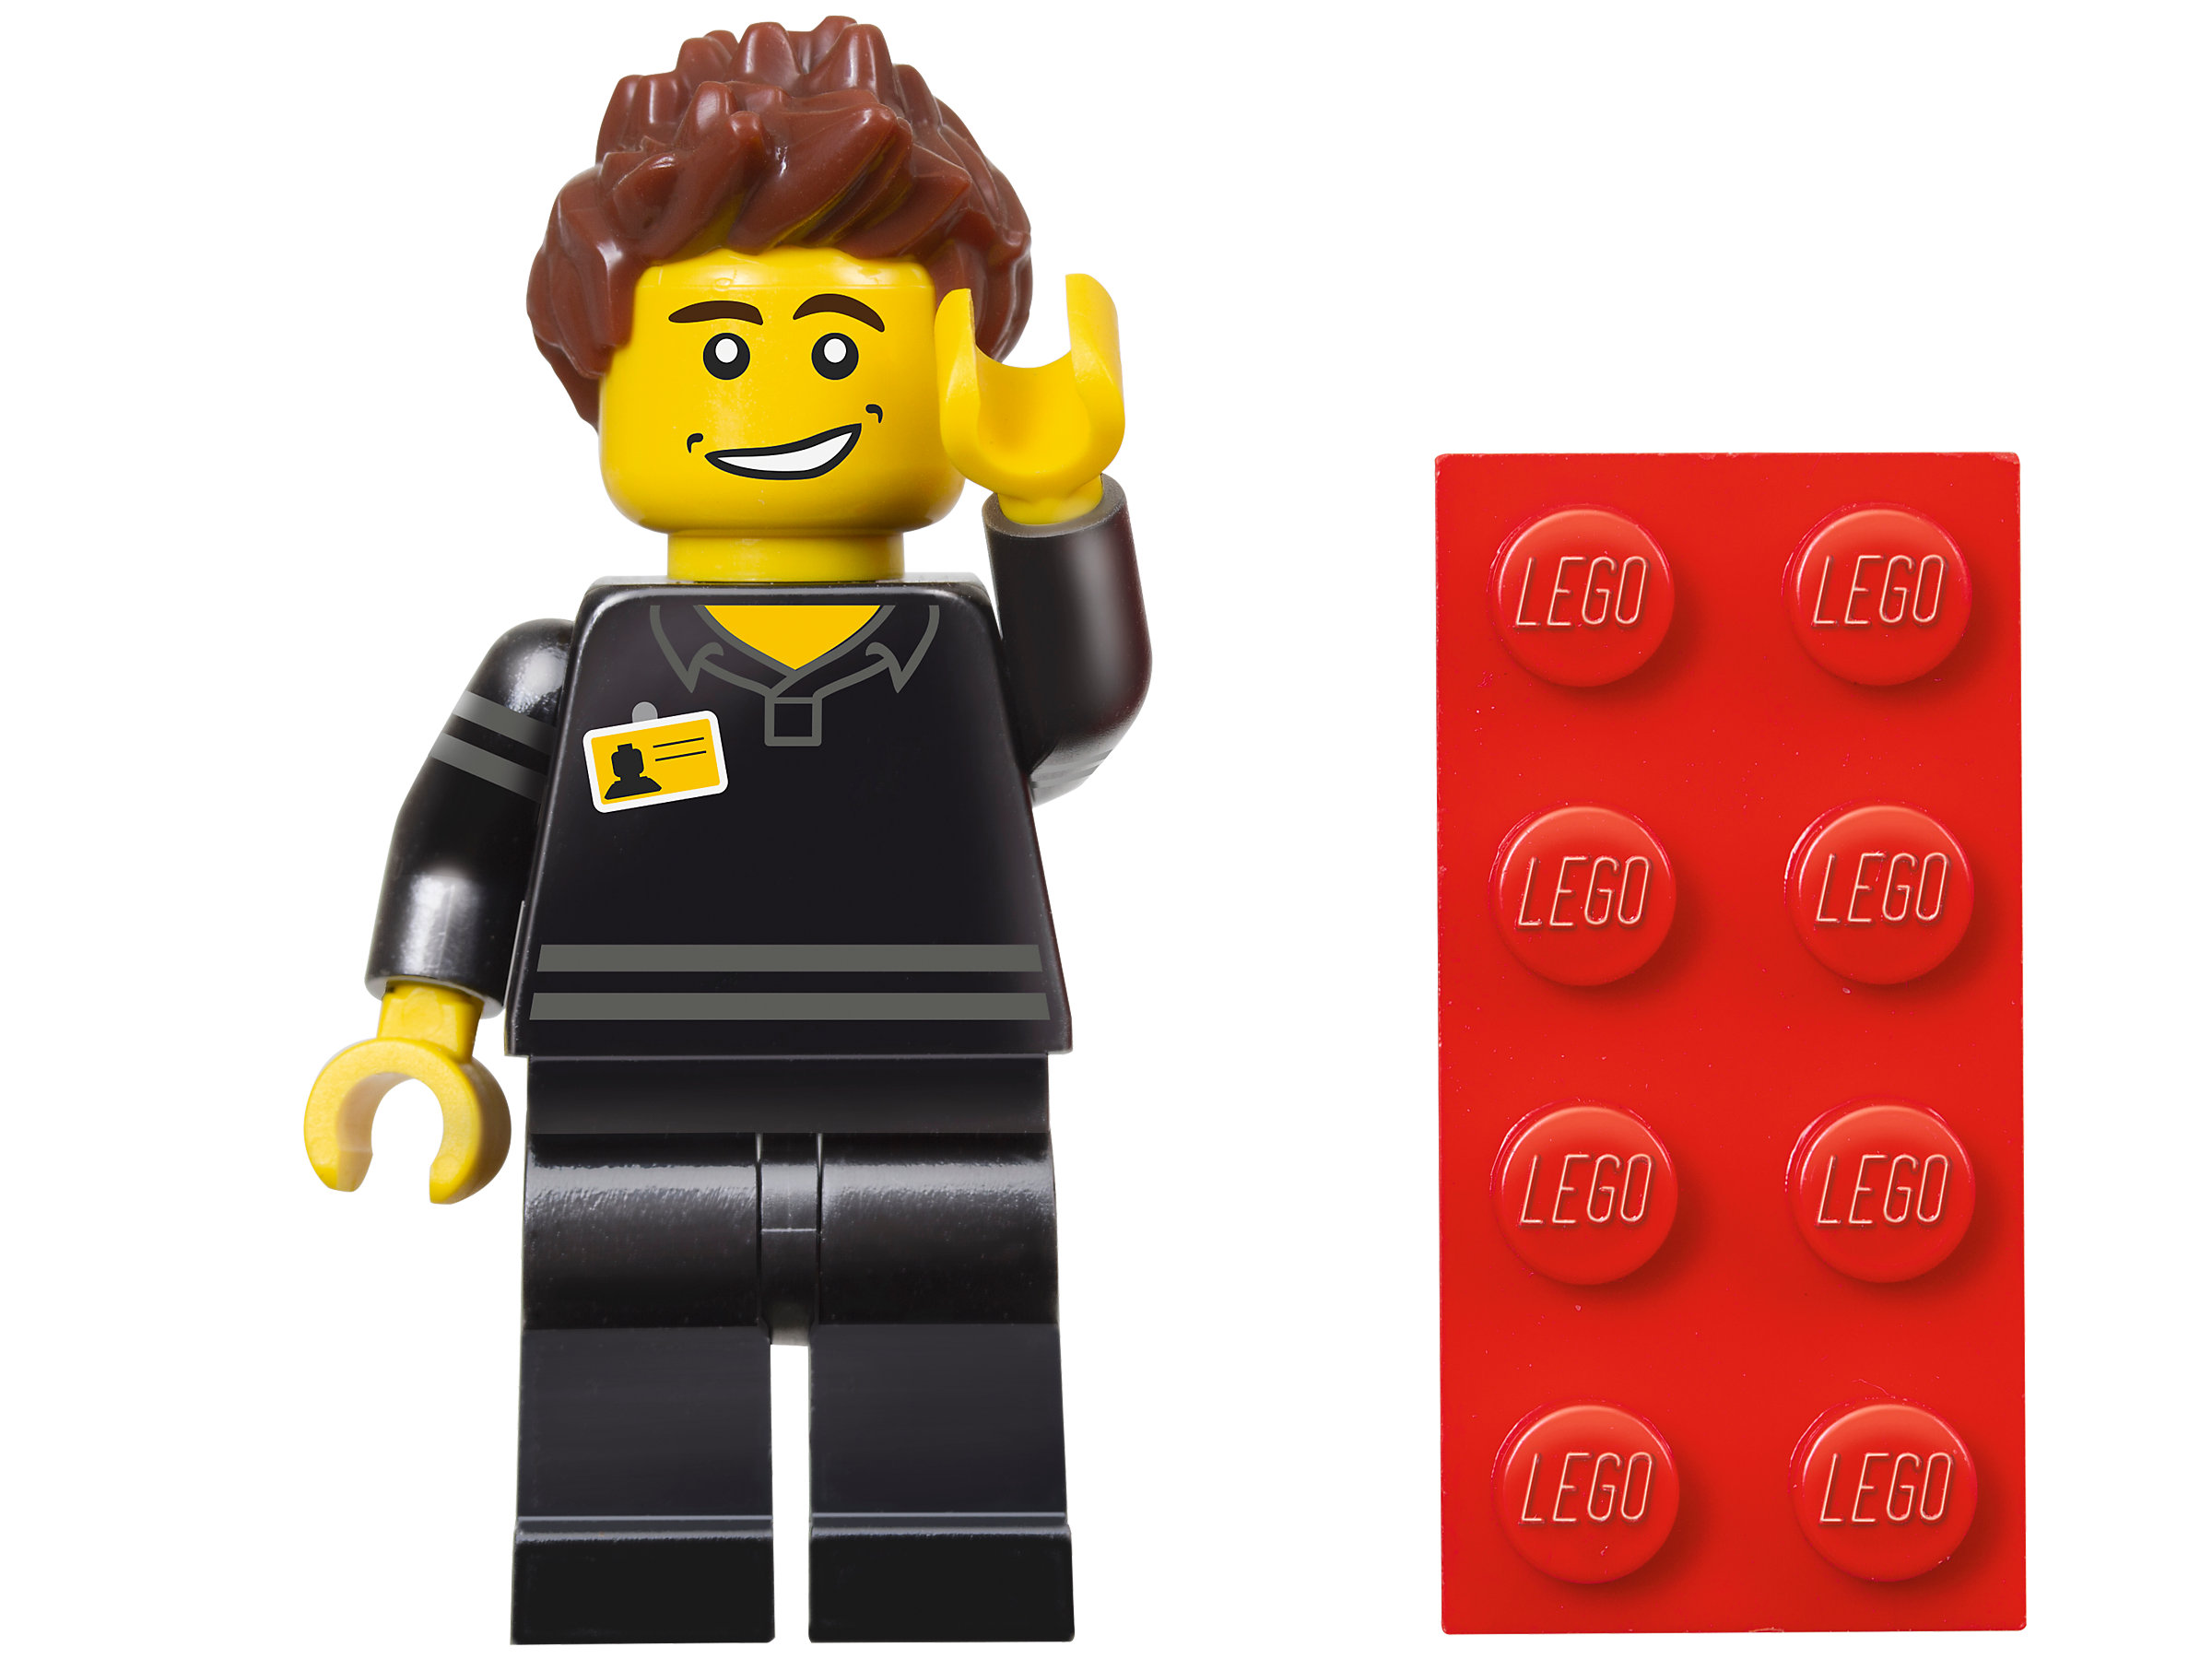 *BRAND NEW* Lego 5001622 LEGO STORE EMPLOYEE Minifig Polybag